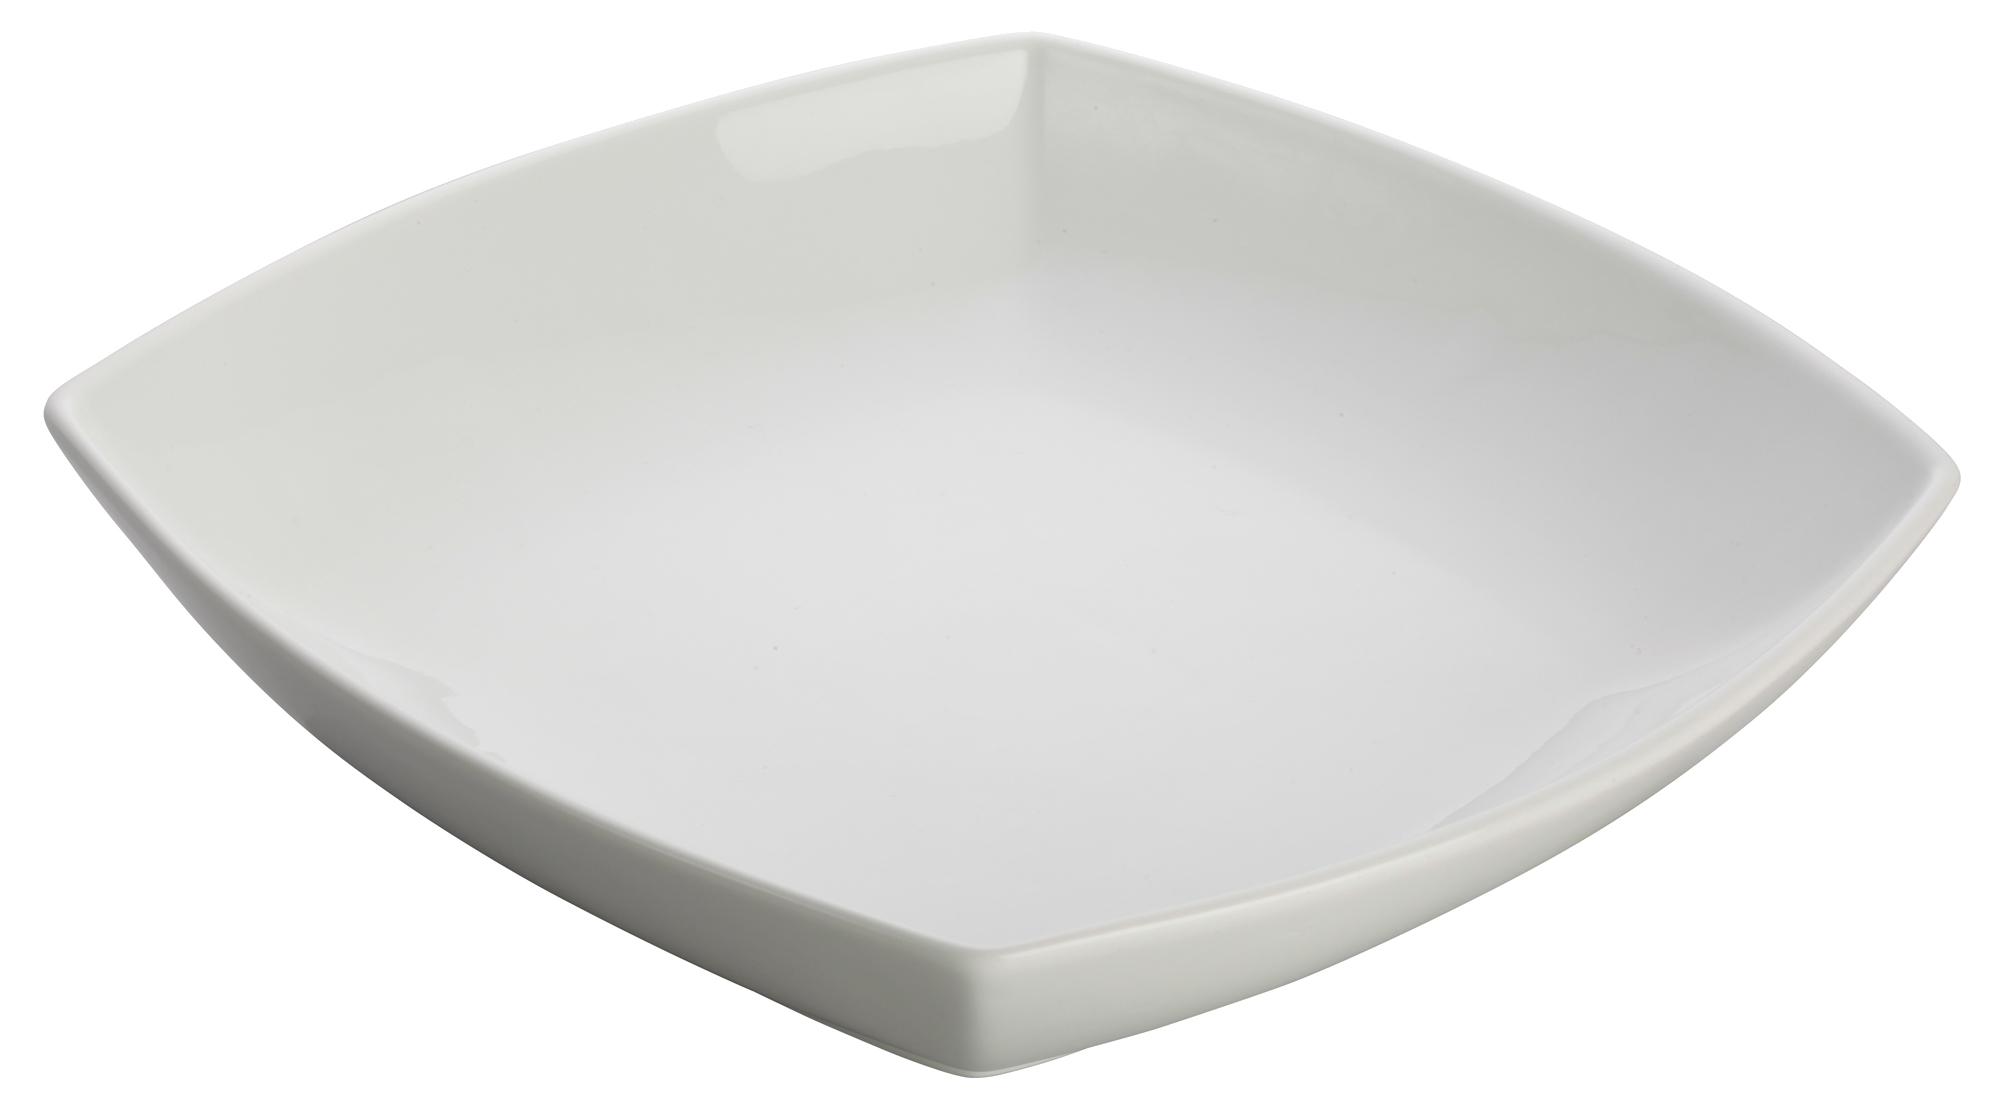 Winco WDP019-101 china, bowl, 33 - 64 oz